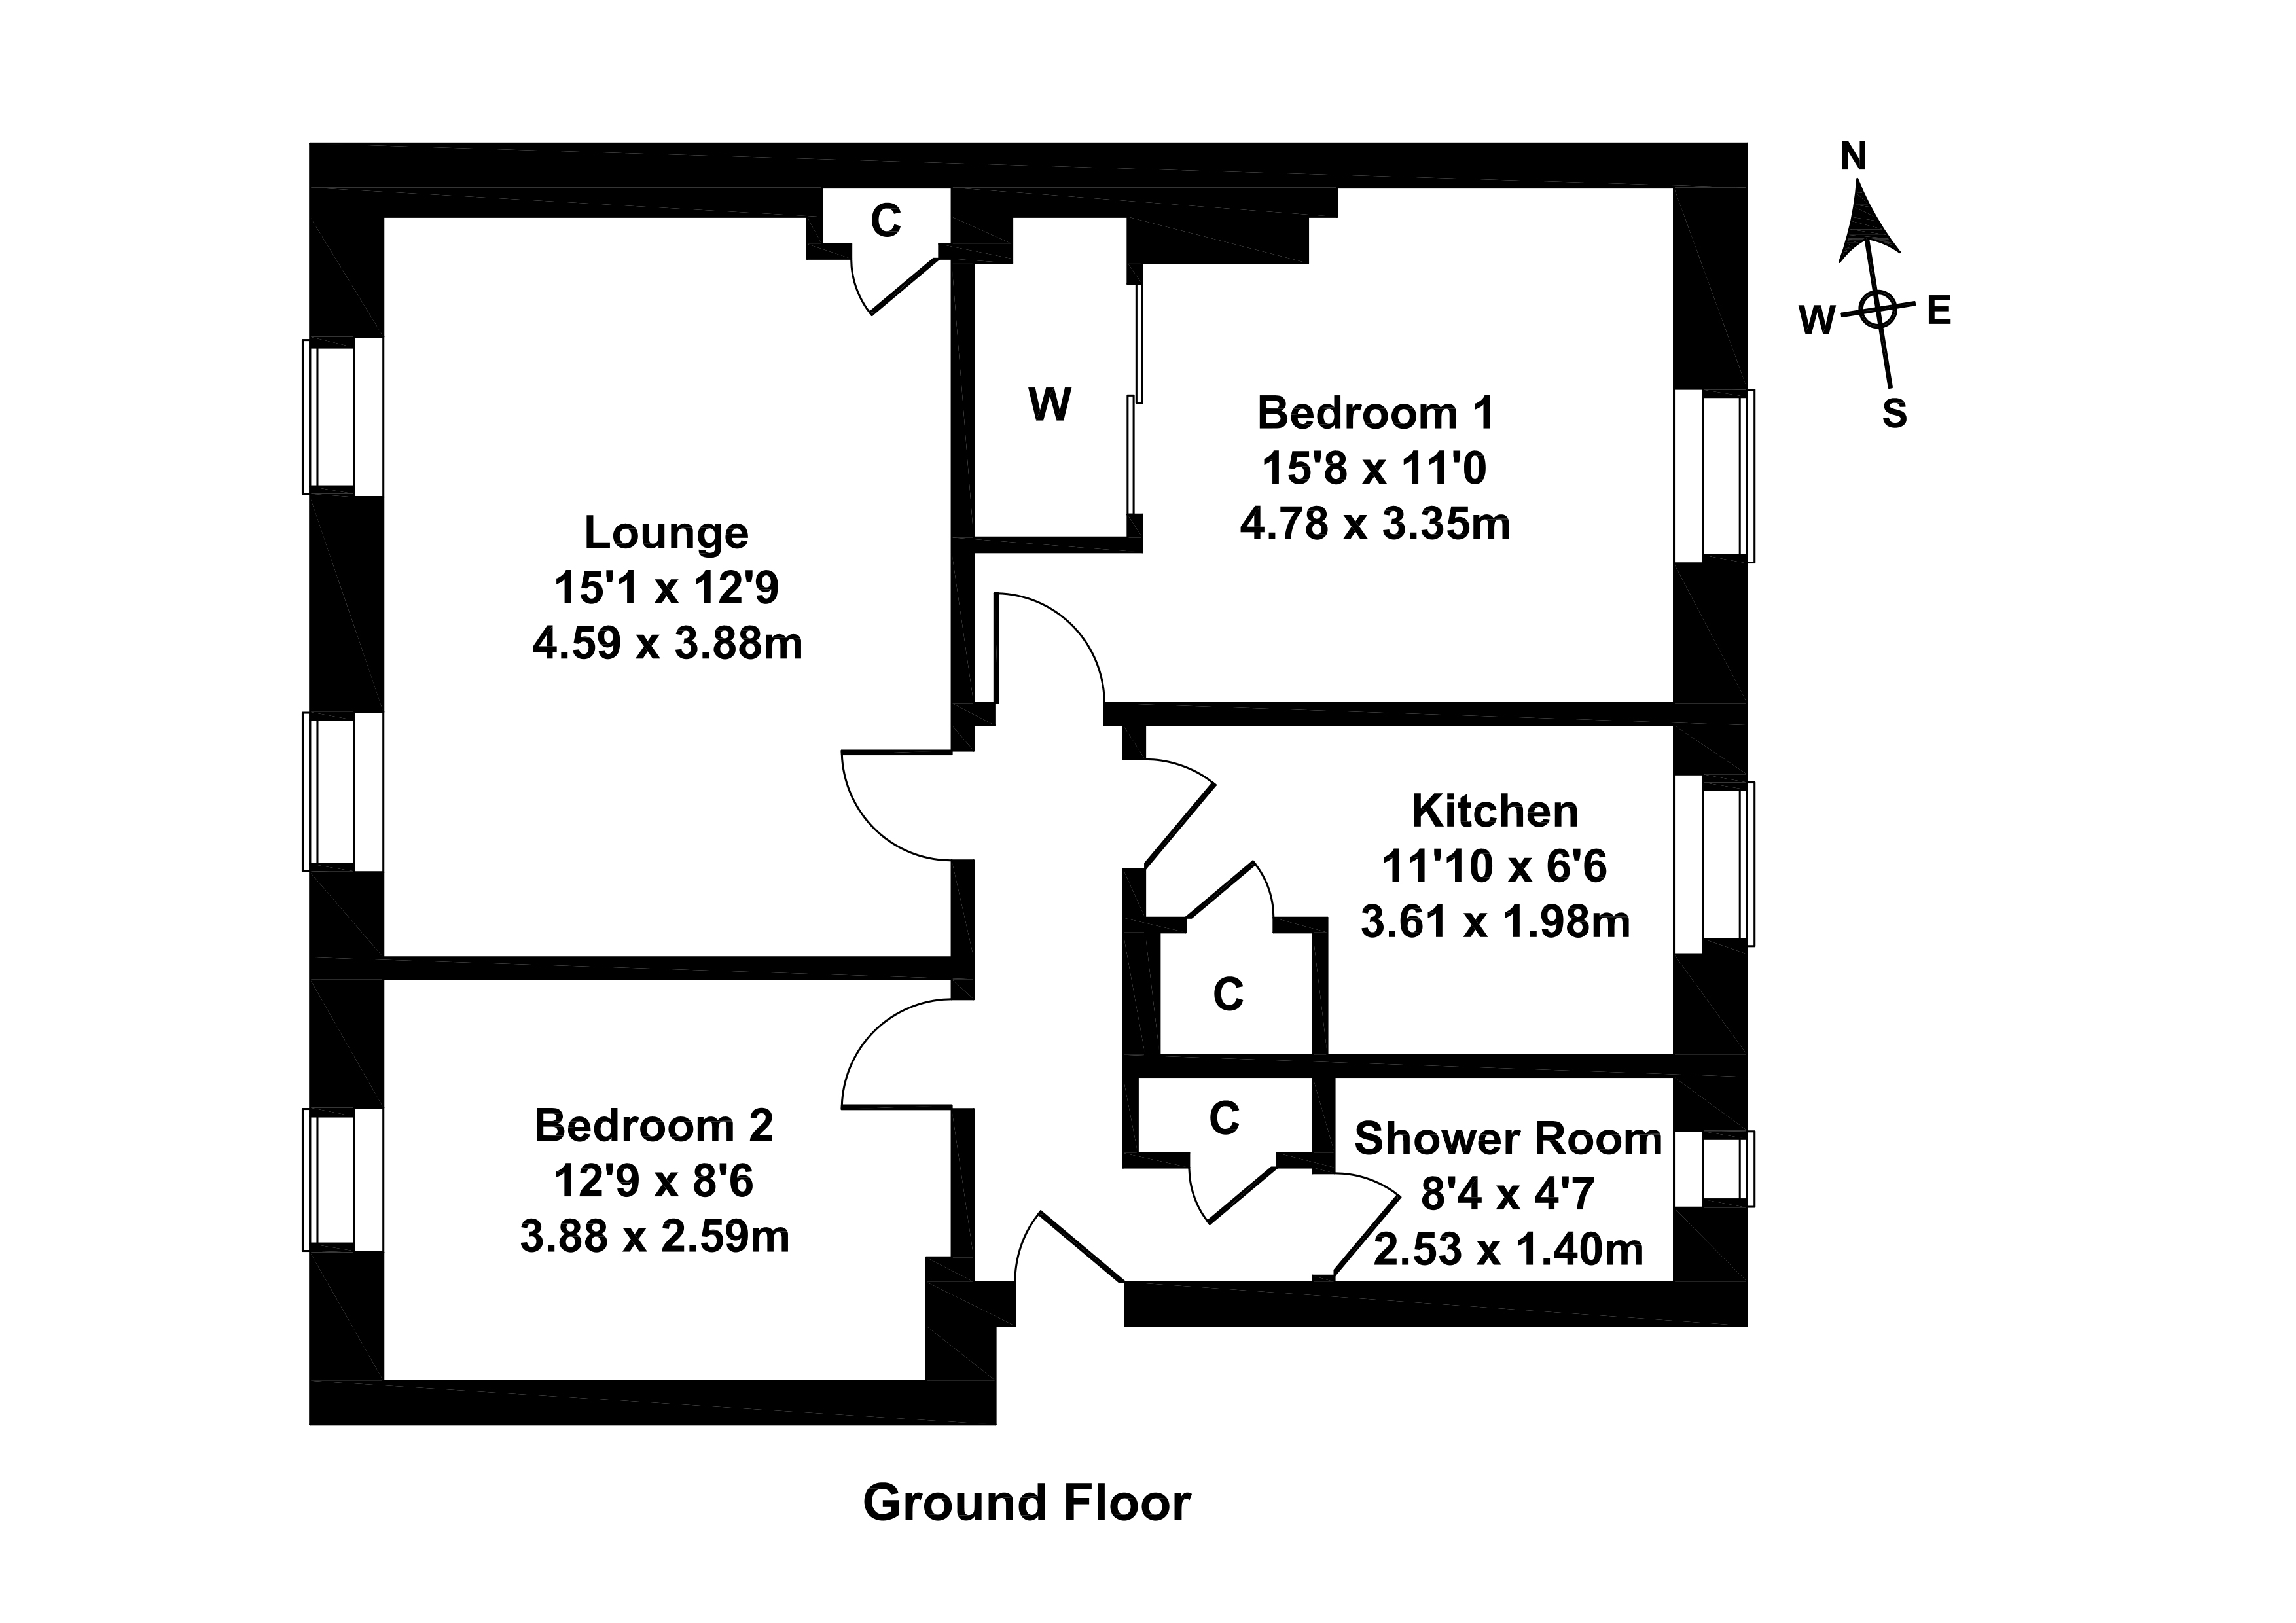 Floorplan 1 of 4/1, West Pilton Grove, Edinburgh, EH4 4BU